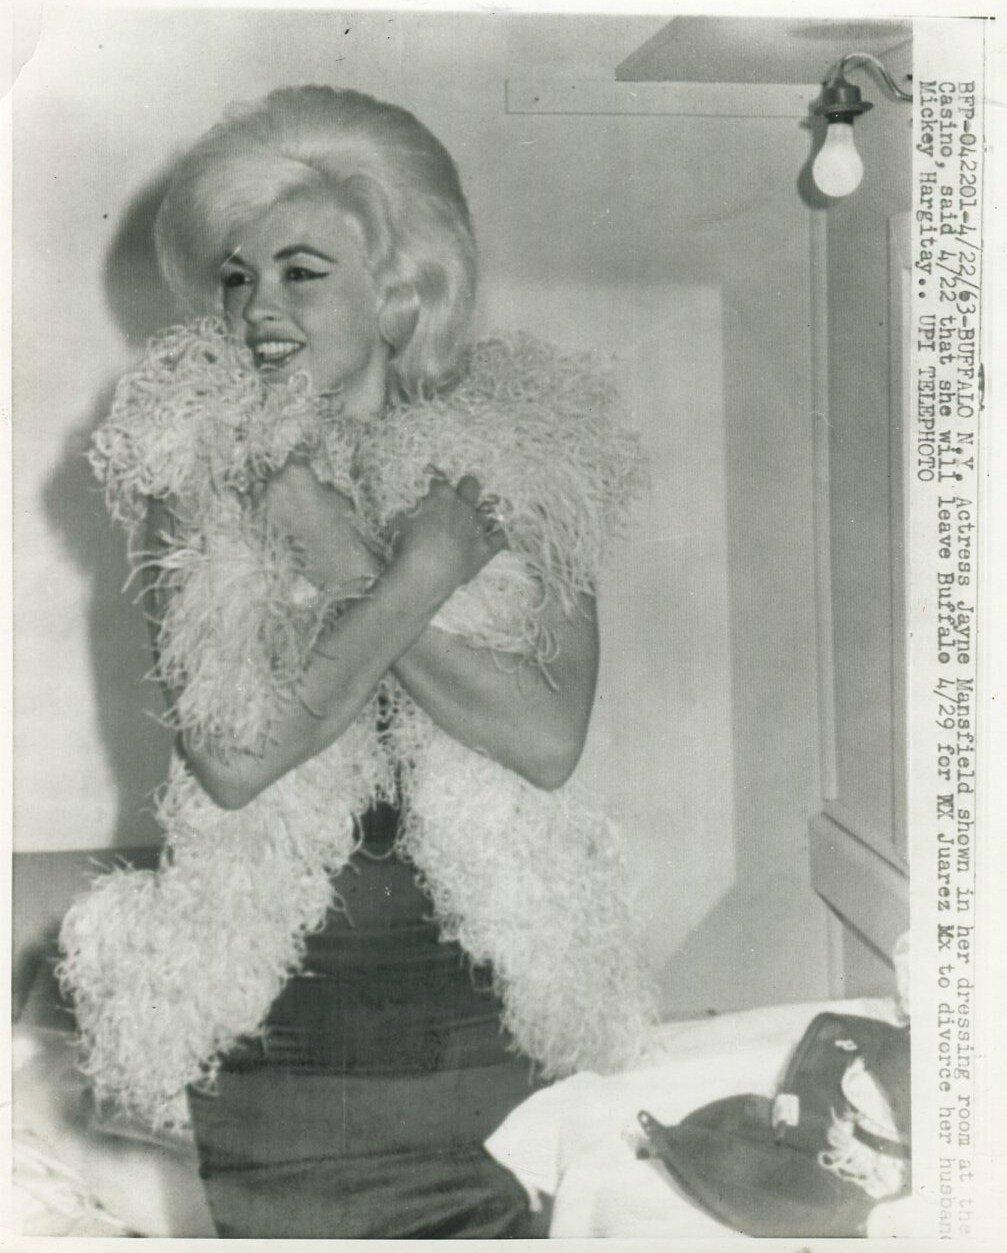 jayne-1963-04-22-buffalo-casino